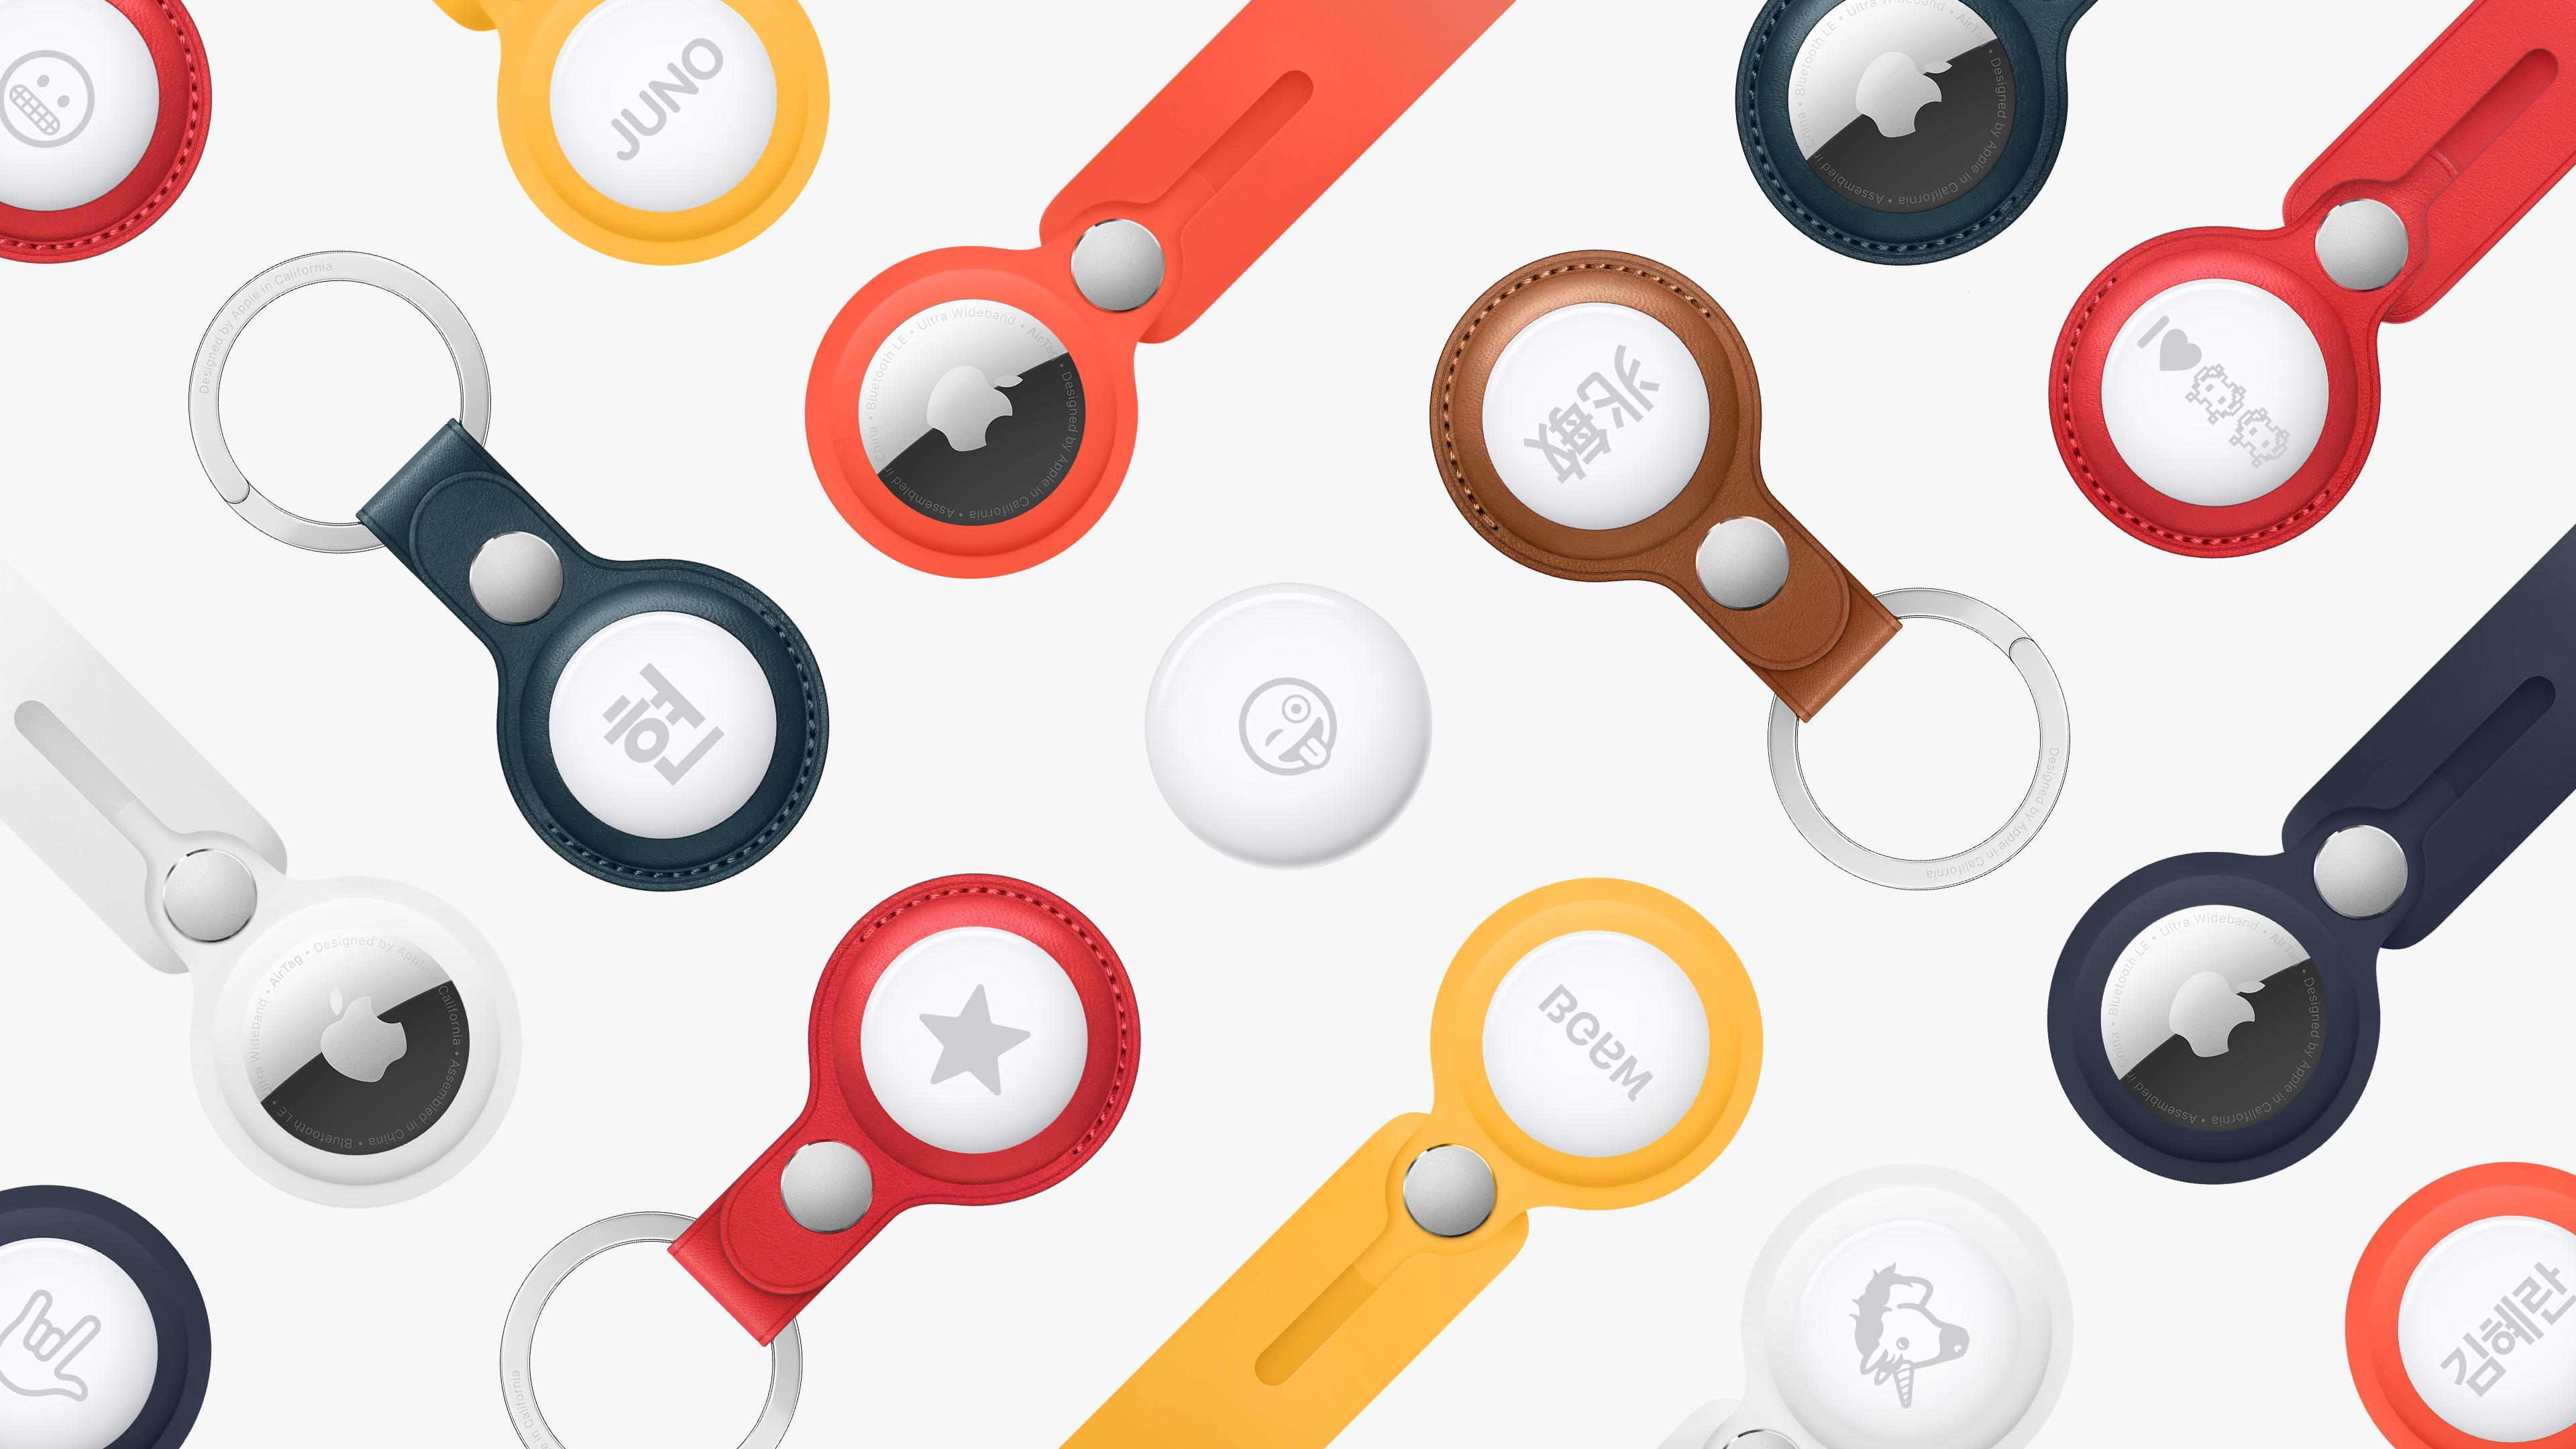 AirTags offiziell enthüllt: Was du über Apples neuen Schlüsselfinder wissen musst